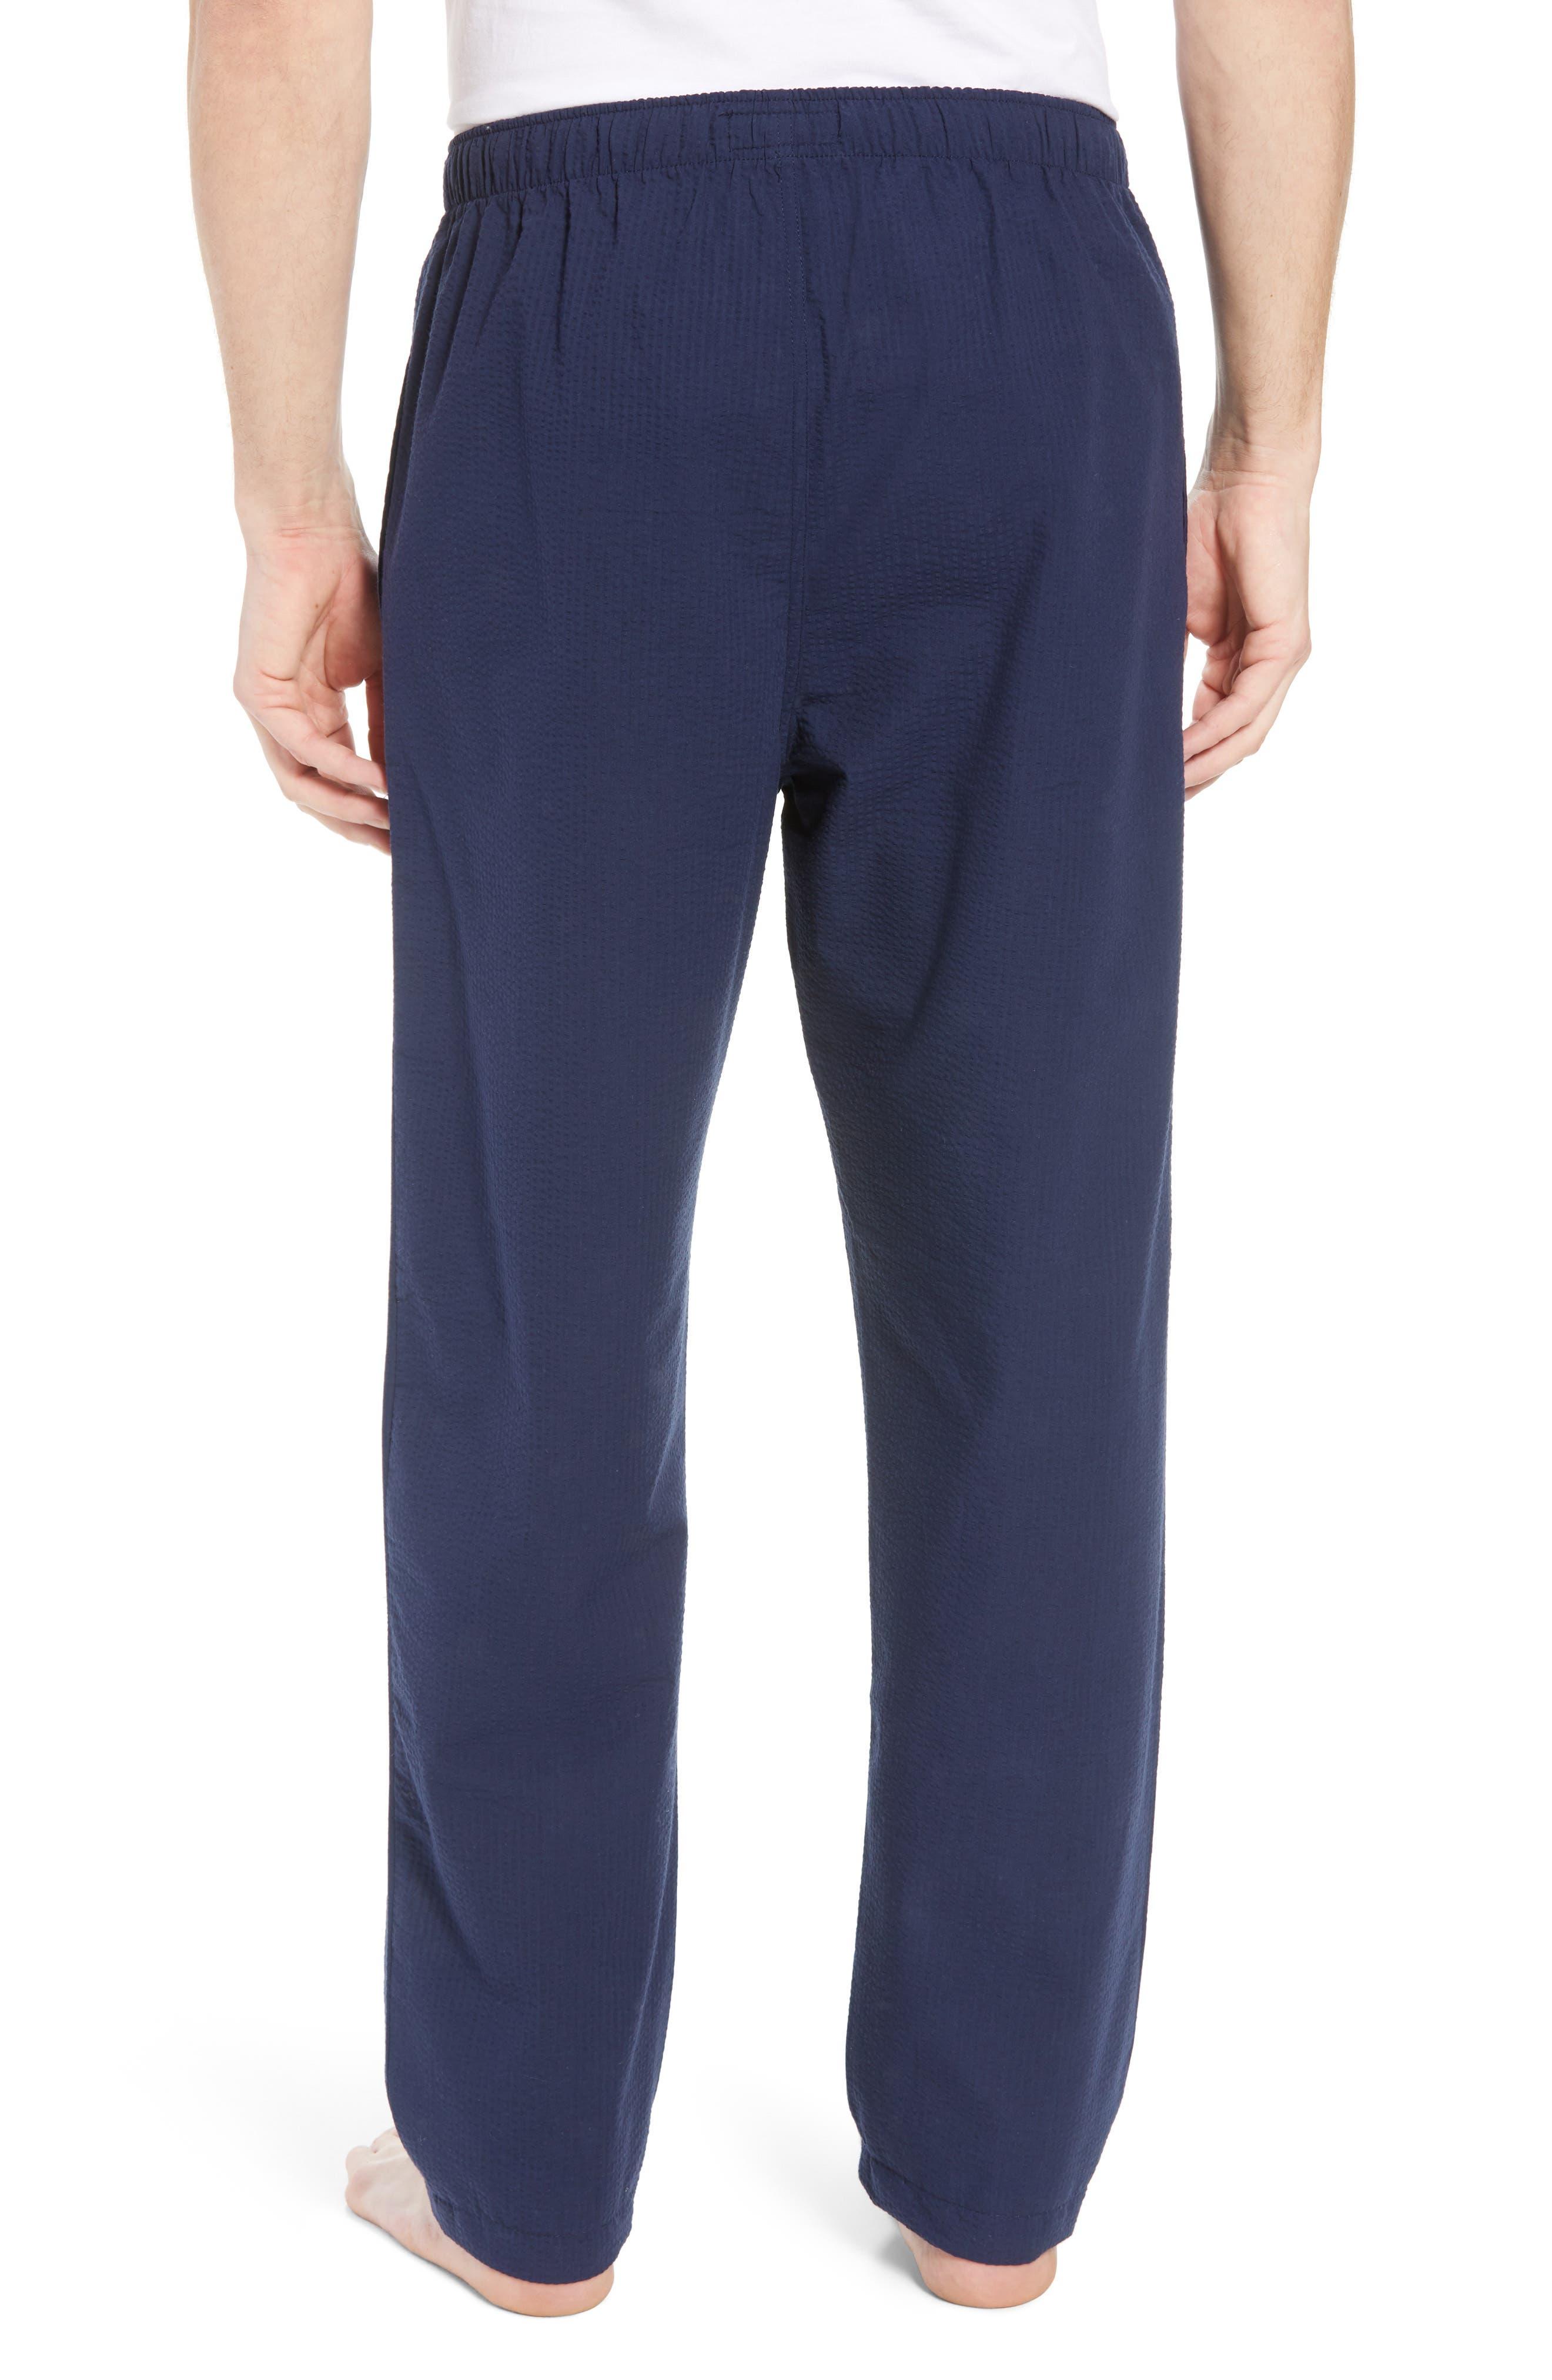 Seersucker Pajama Pants,                             Alternate thumbnail 2, color,                             NAVY SEERSUCKER